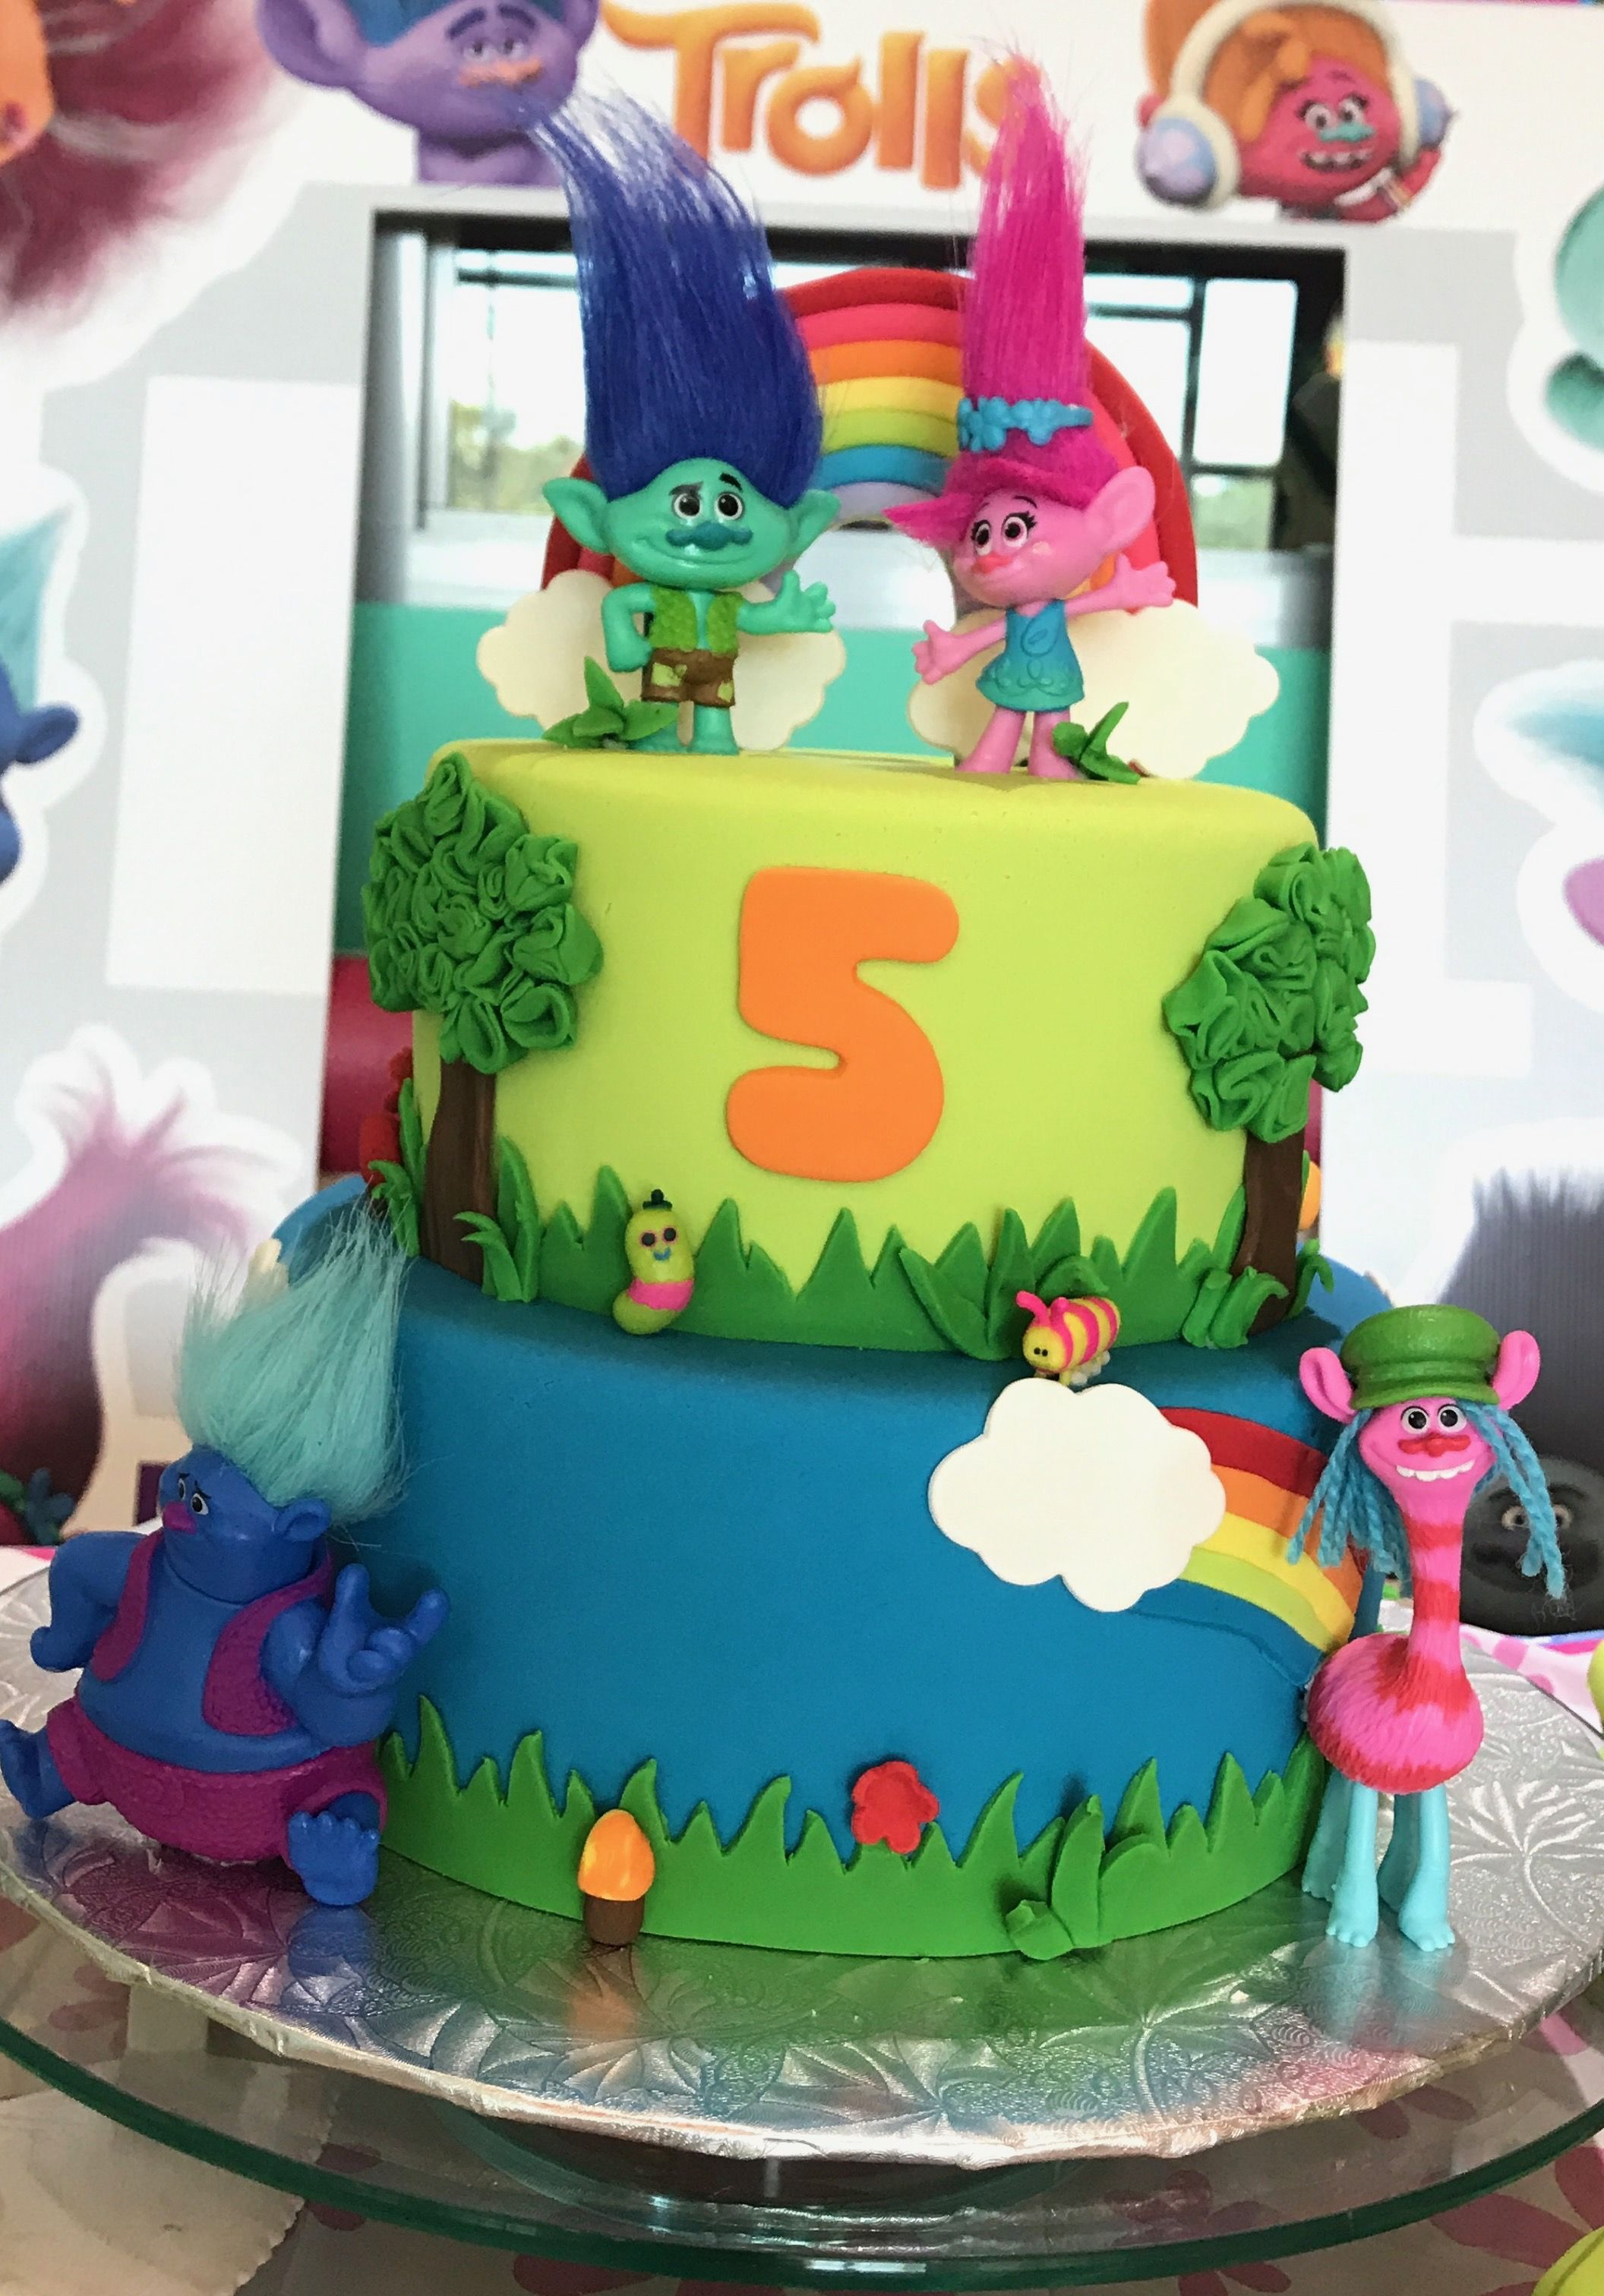 Cake Design Trolls : Trolls Birthday Cake! Trolls Birthday Party Pinterest ...